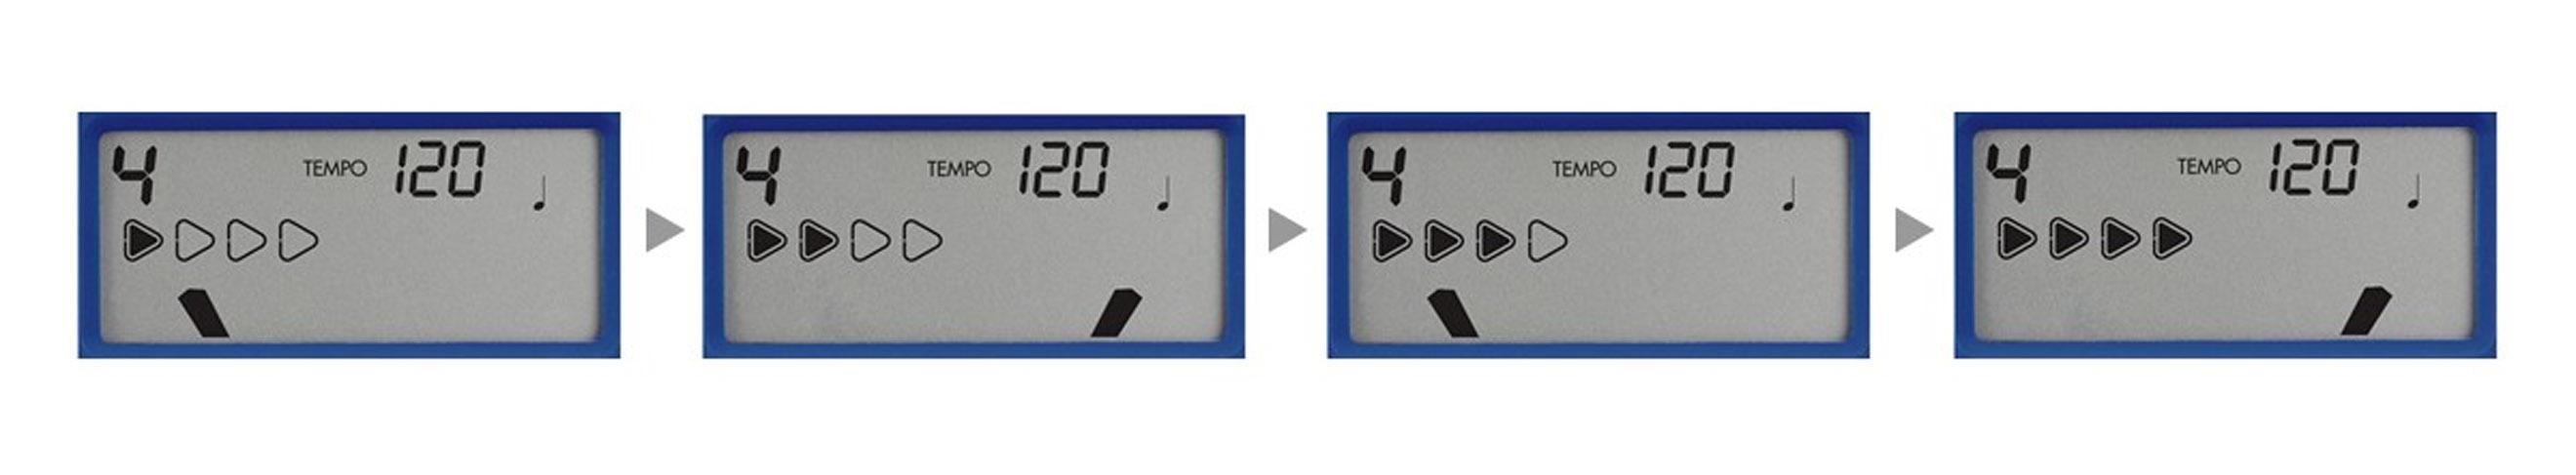 metronomo digitale